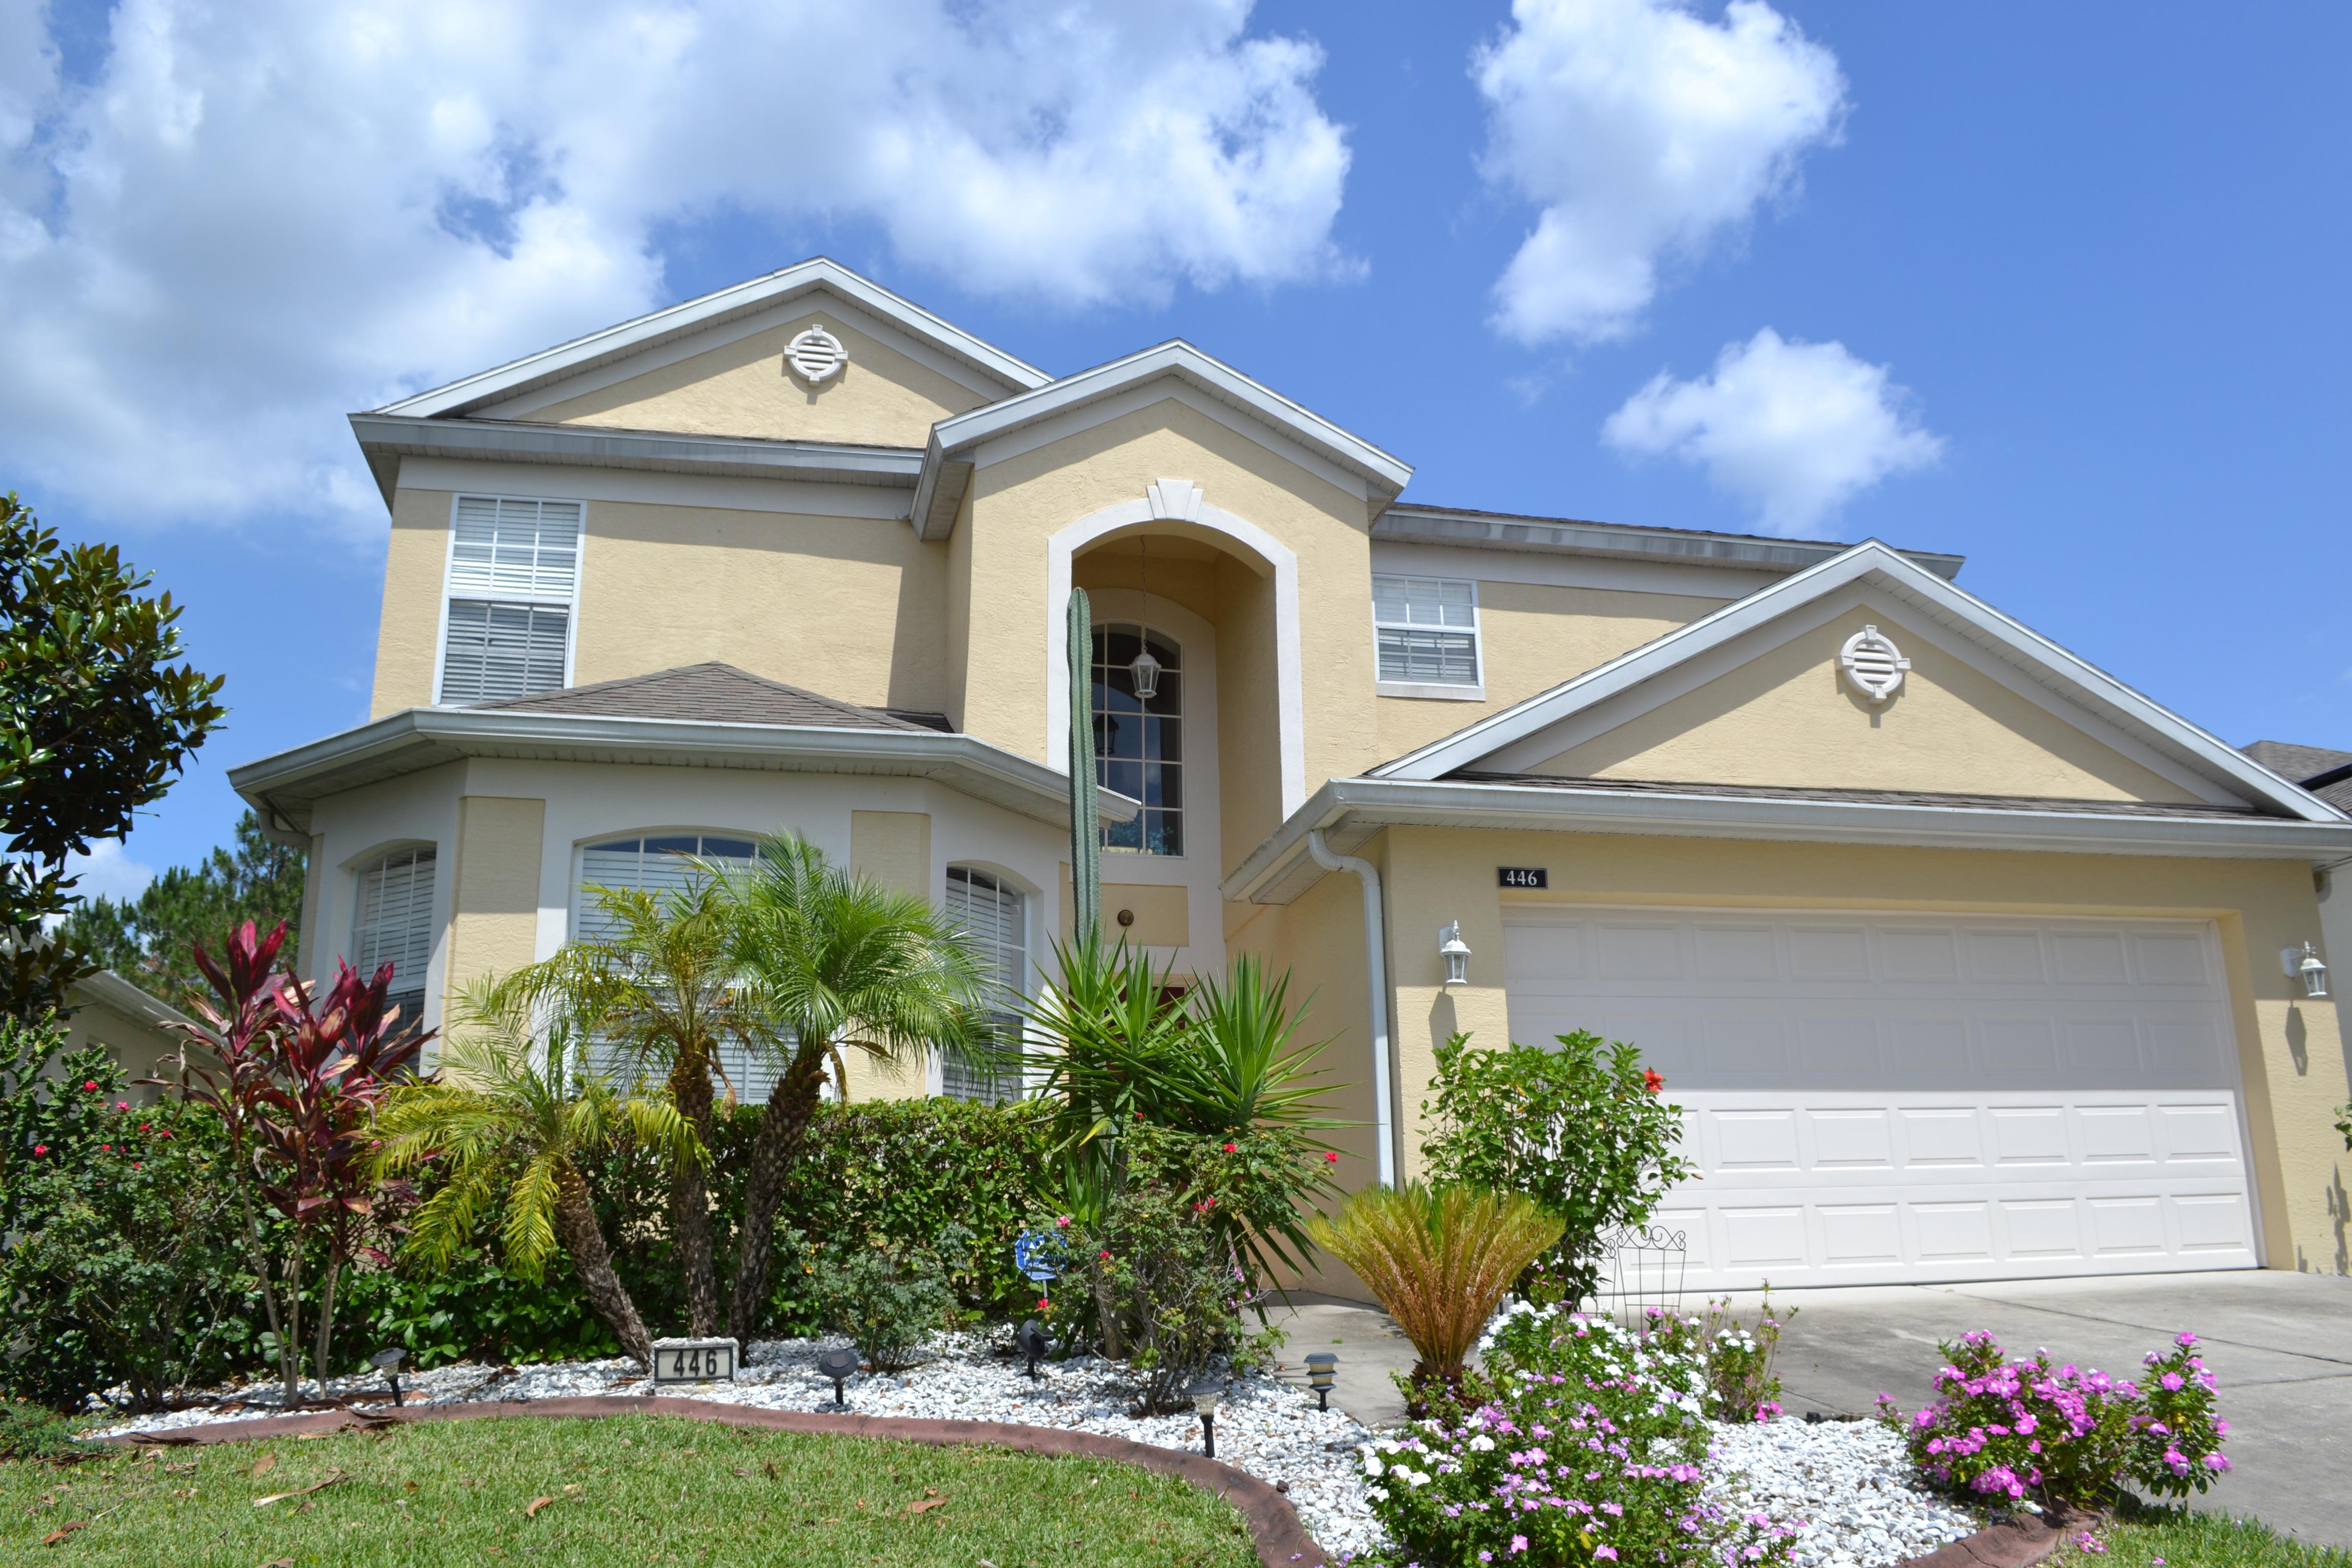 Rent a villa in Orlando - we have plenty of luxury villas to choose from